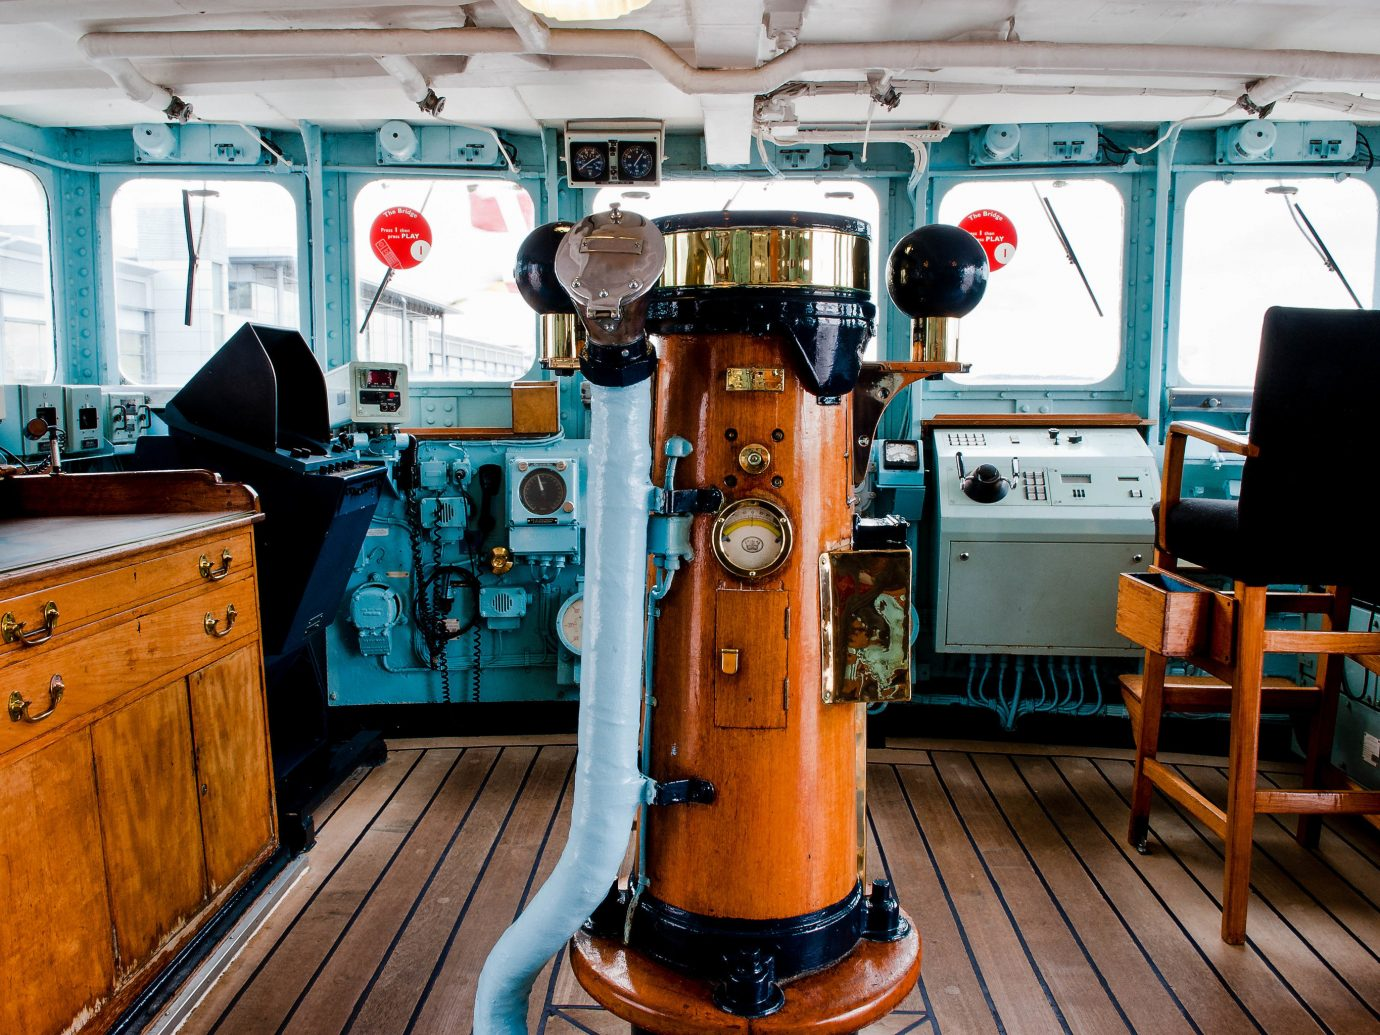 Edinburgh Hotels Jetsetter Guides Scotland Travel Tips Trip Ideas floor indoor vehicle Boat Deck furniture kitchen appliance